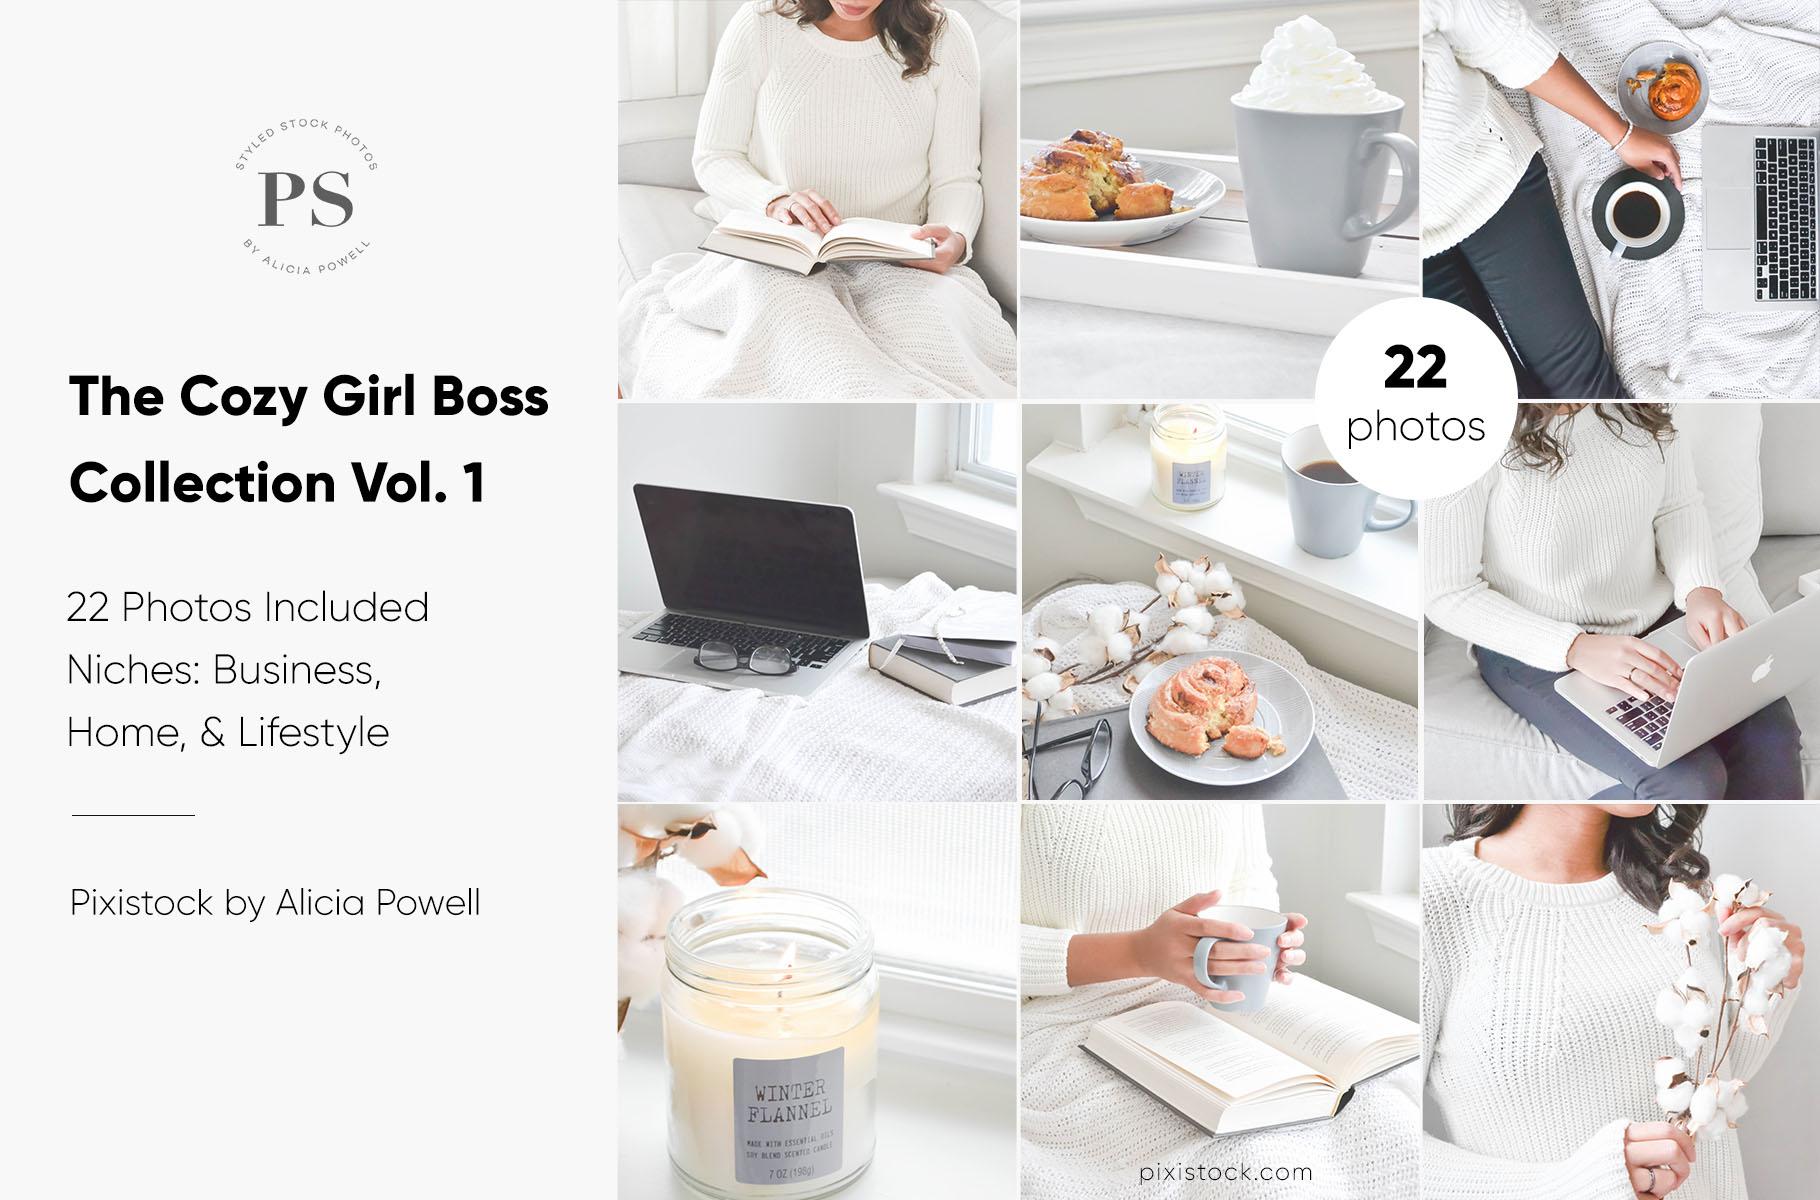 Cozy Gray Girlboss Stock Photo Collection